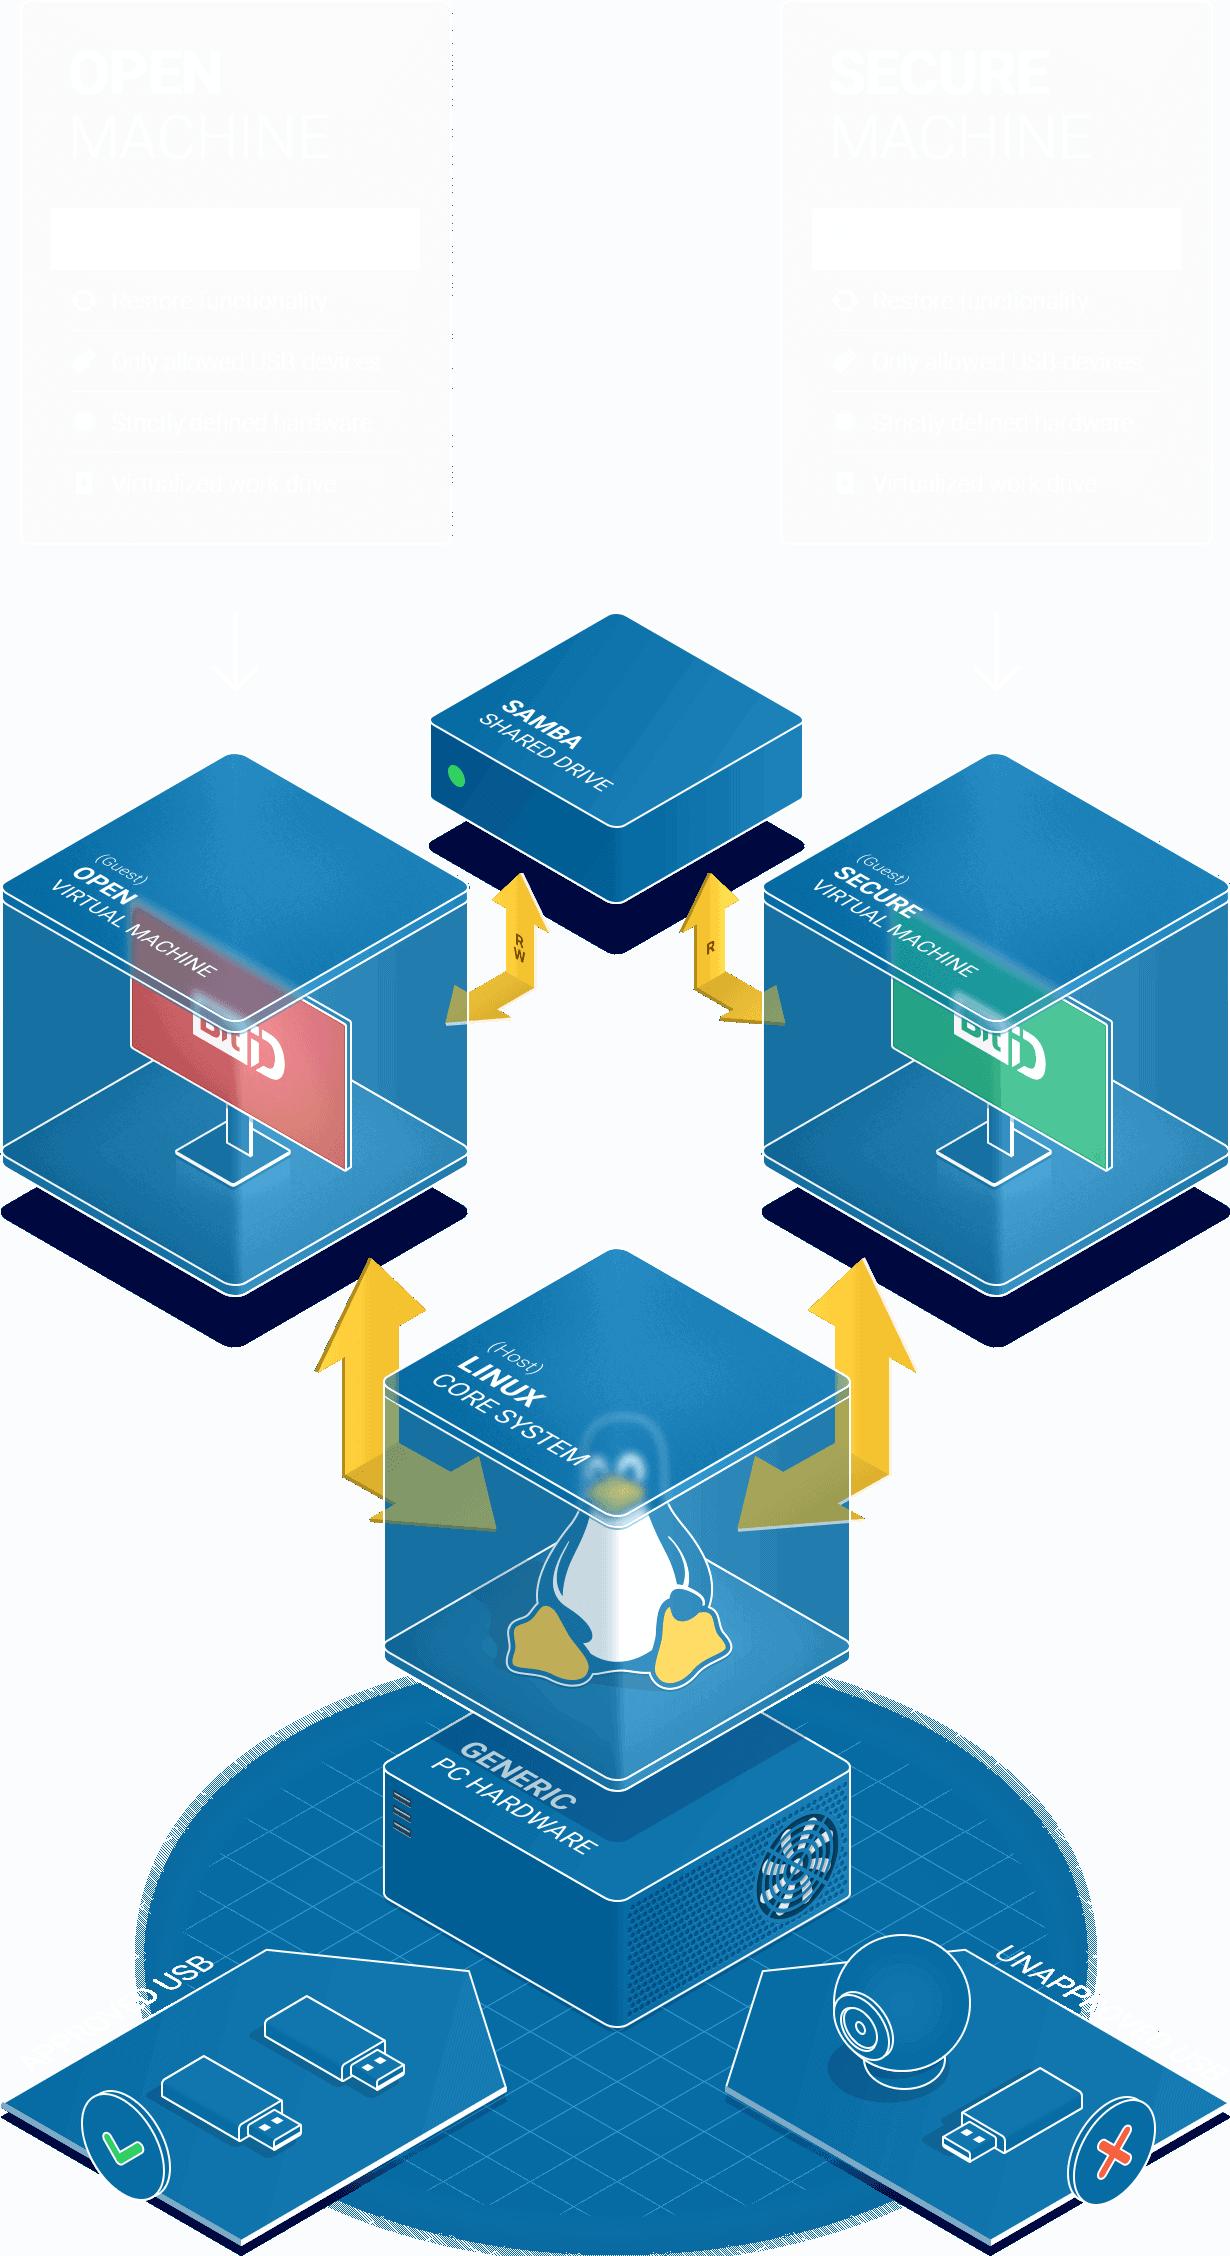 Illustration of the SDL system